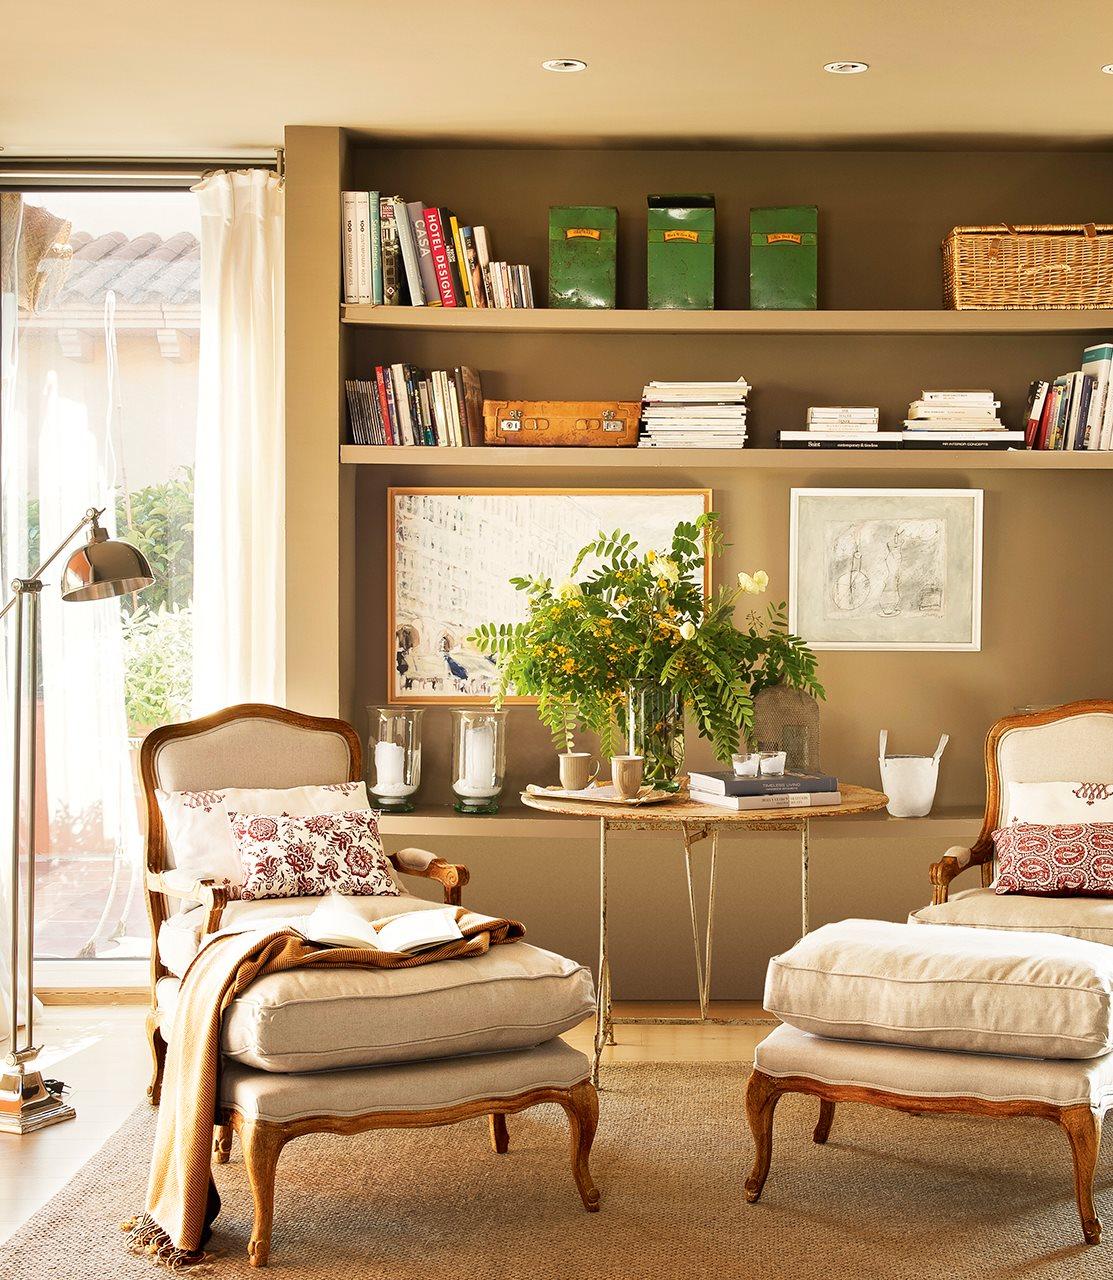 Gana espacio solo con baldas - Decoracion de librerias ...